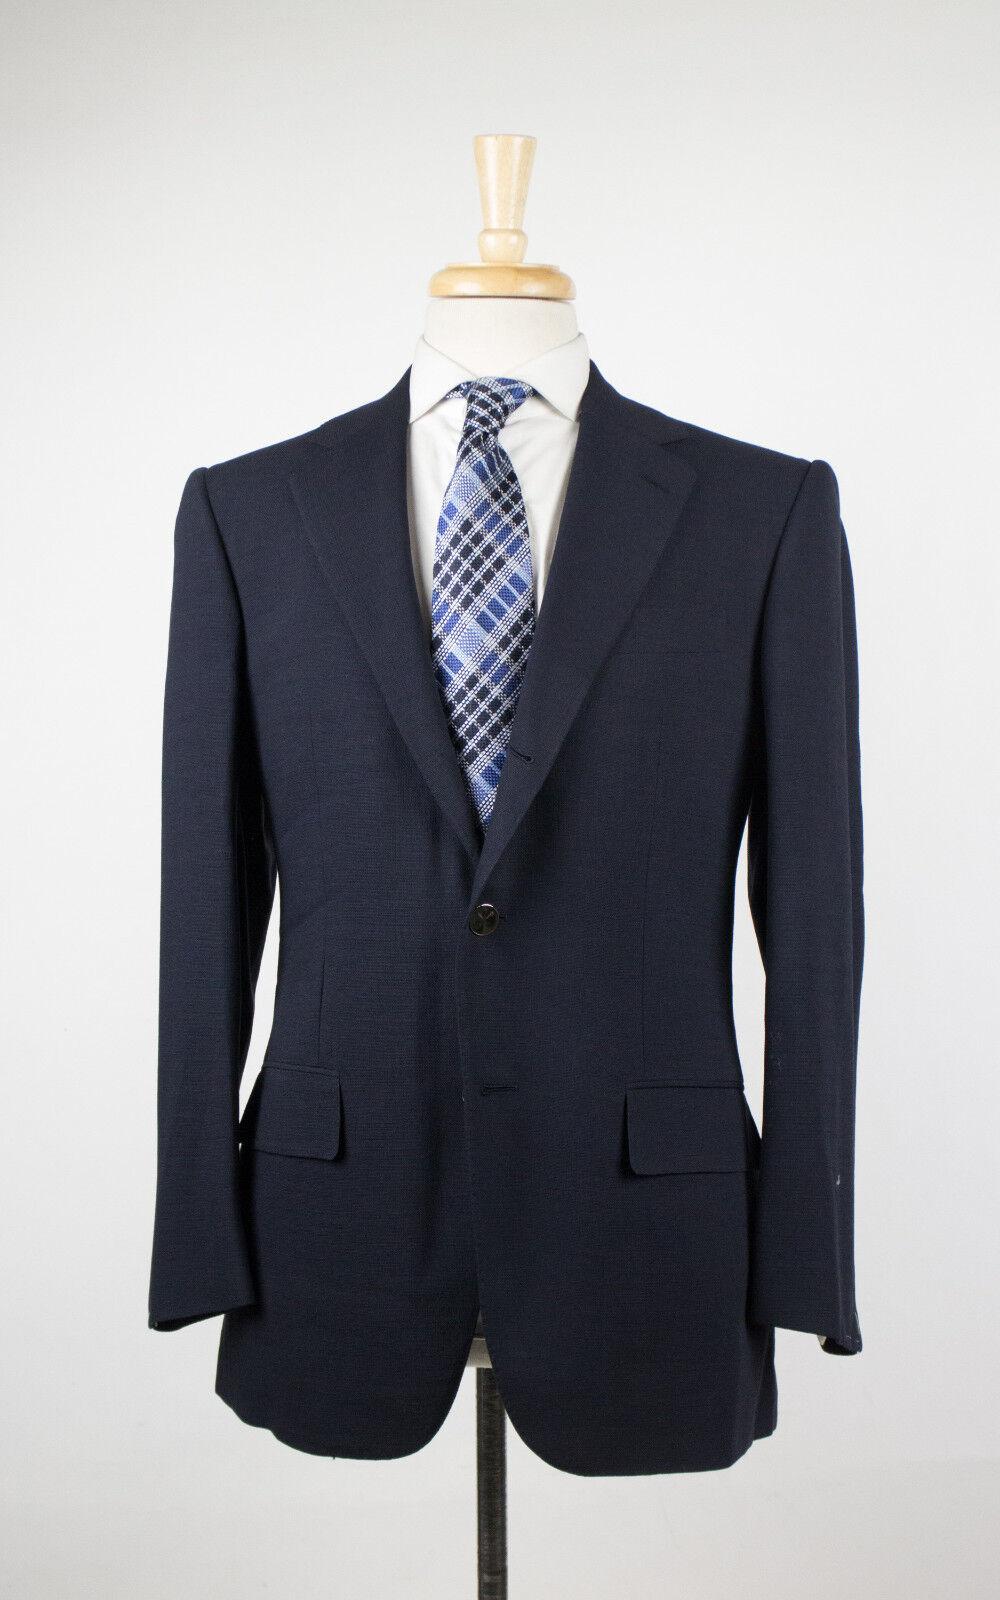 New D'AVENZA Navy Blau Wool 3 Roll 2 Button Sport Coat Größe 50/40 R 2995